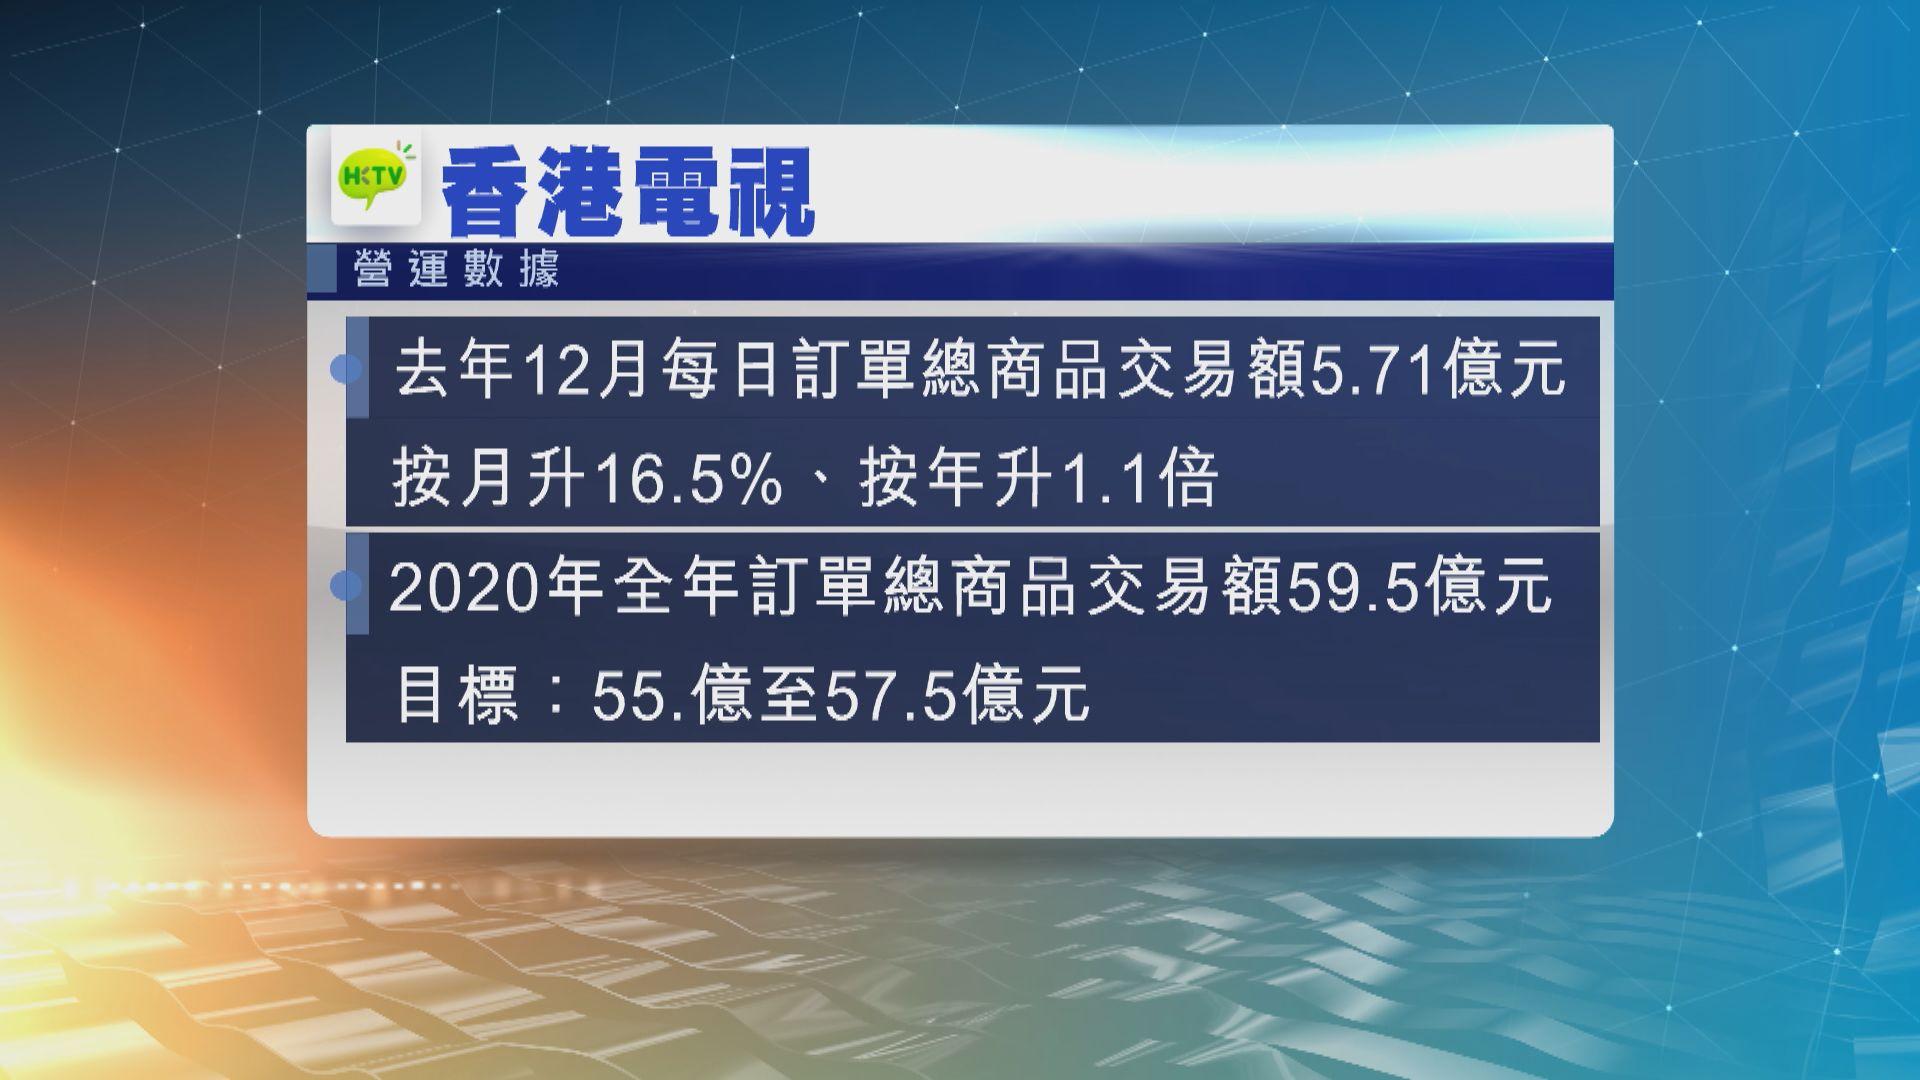 HKTVmall去年訂單總交易額超預期